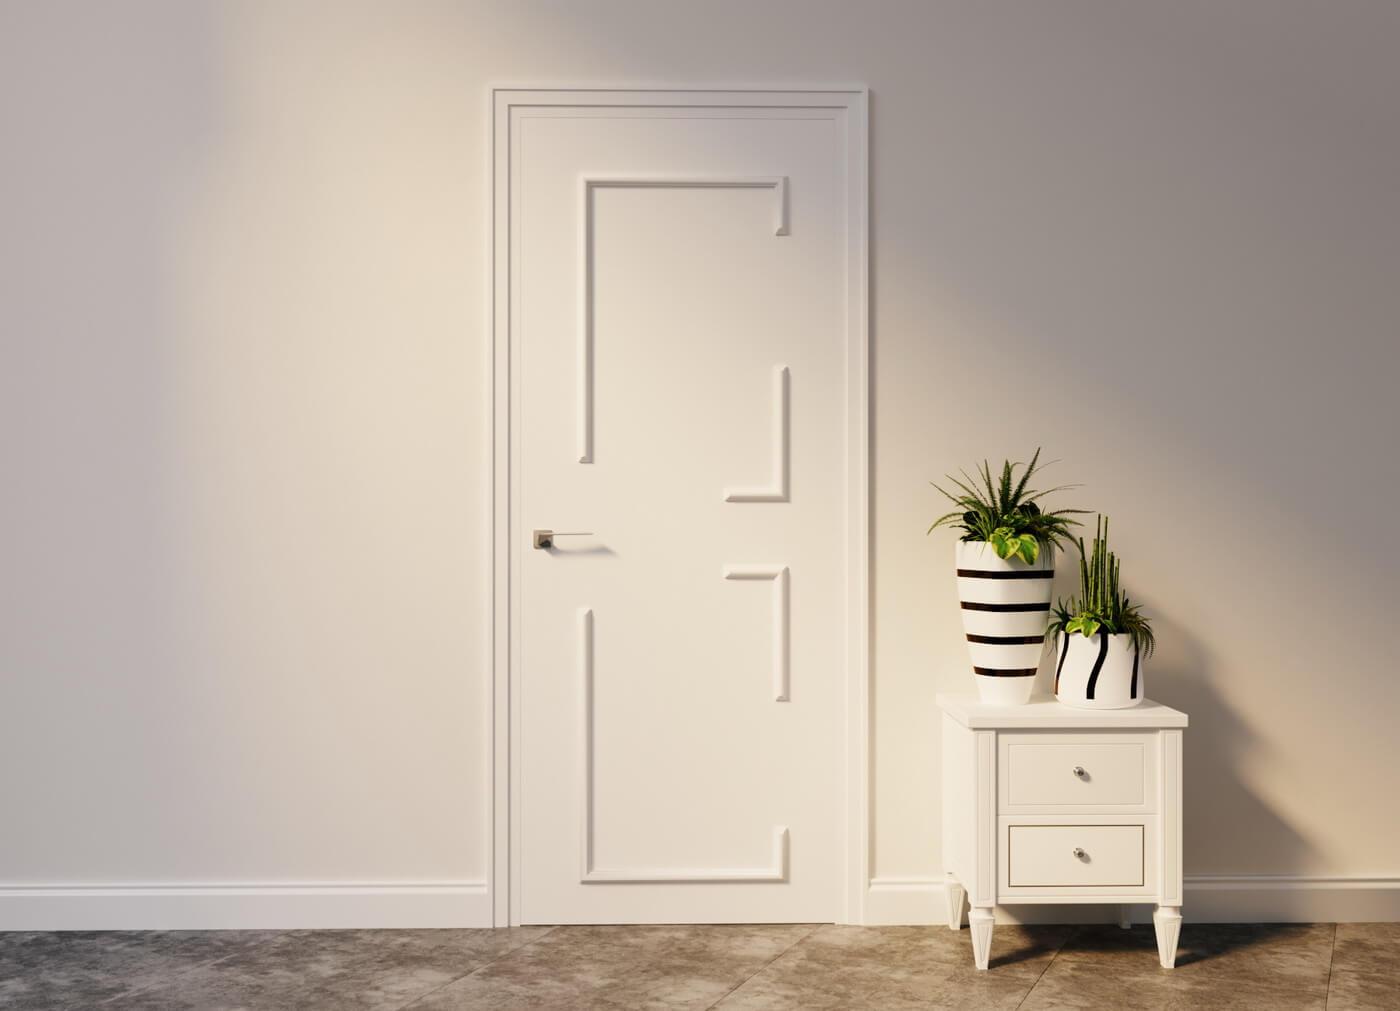 Предметный дизайн_Дверь NewClass 7_1